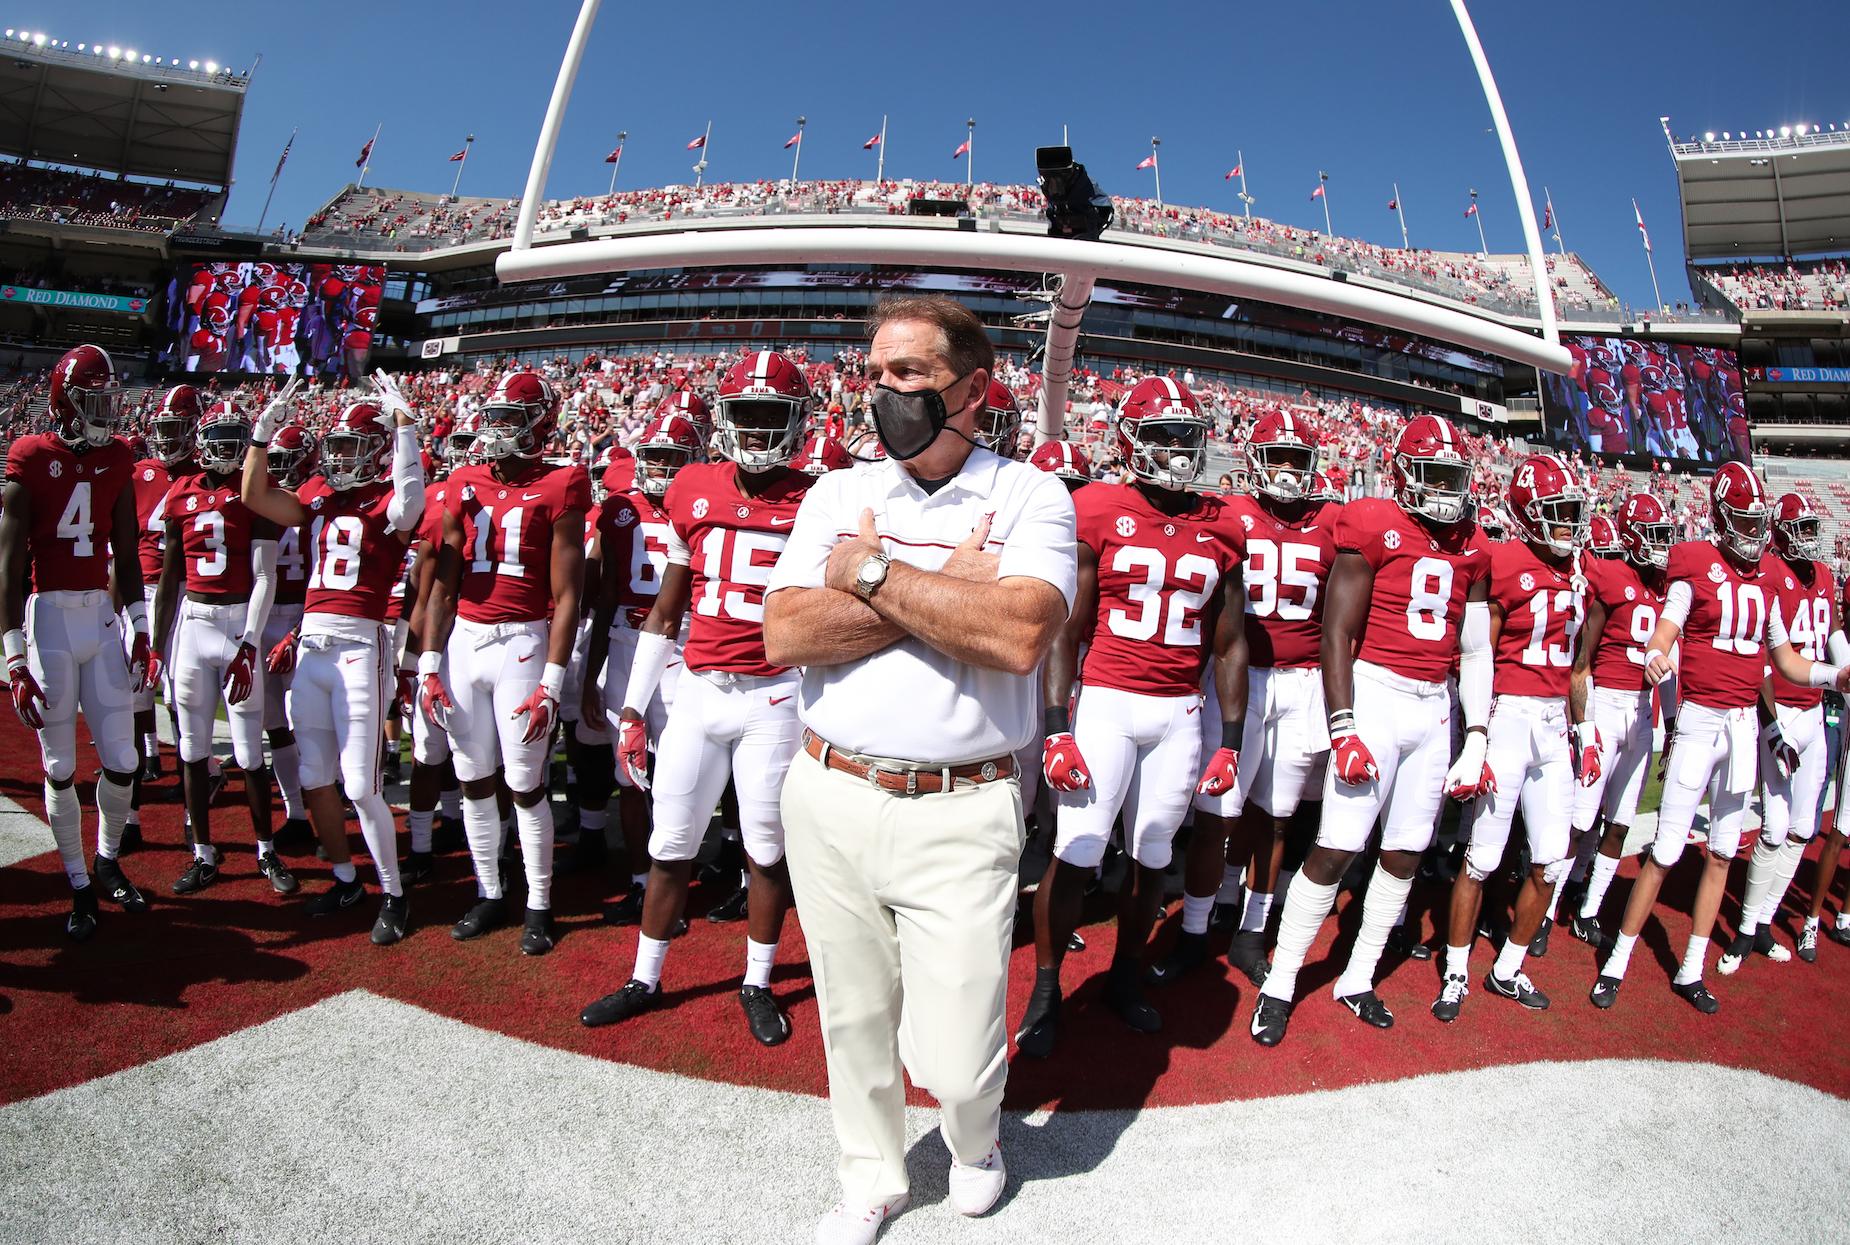 Nick Saban's massive Alabama salary makes him the highest-paid NCAA football coach.